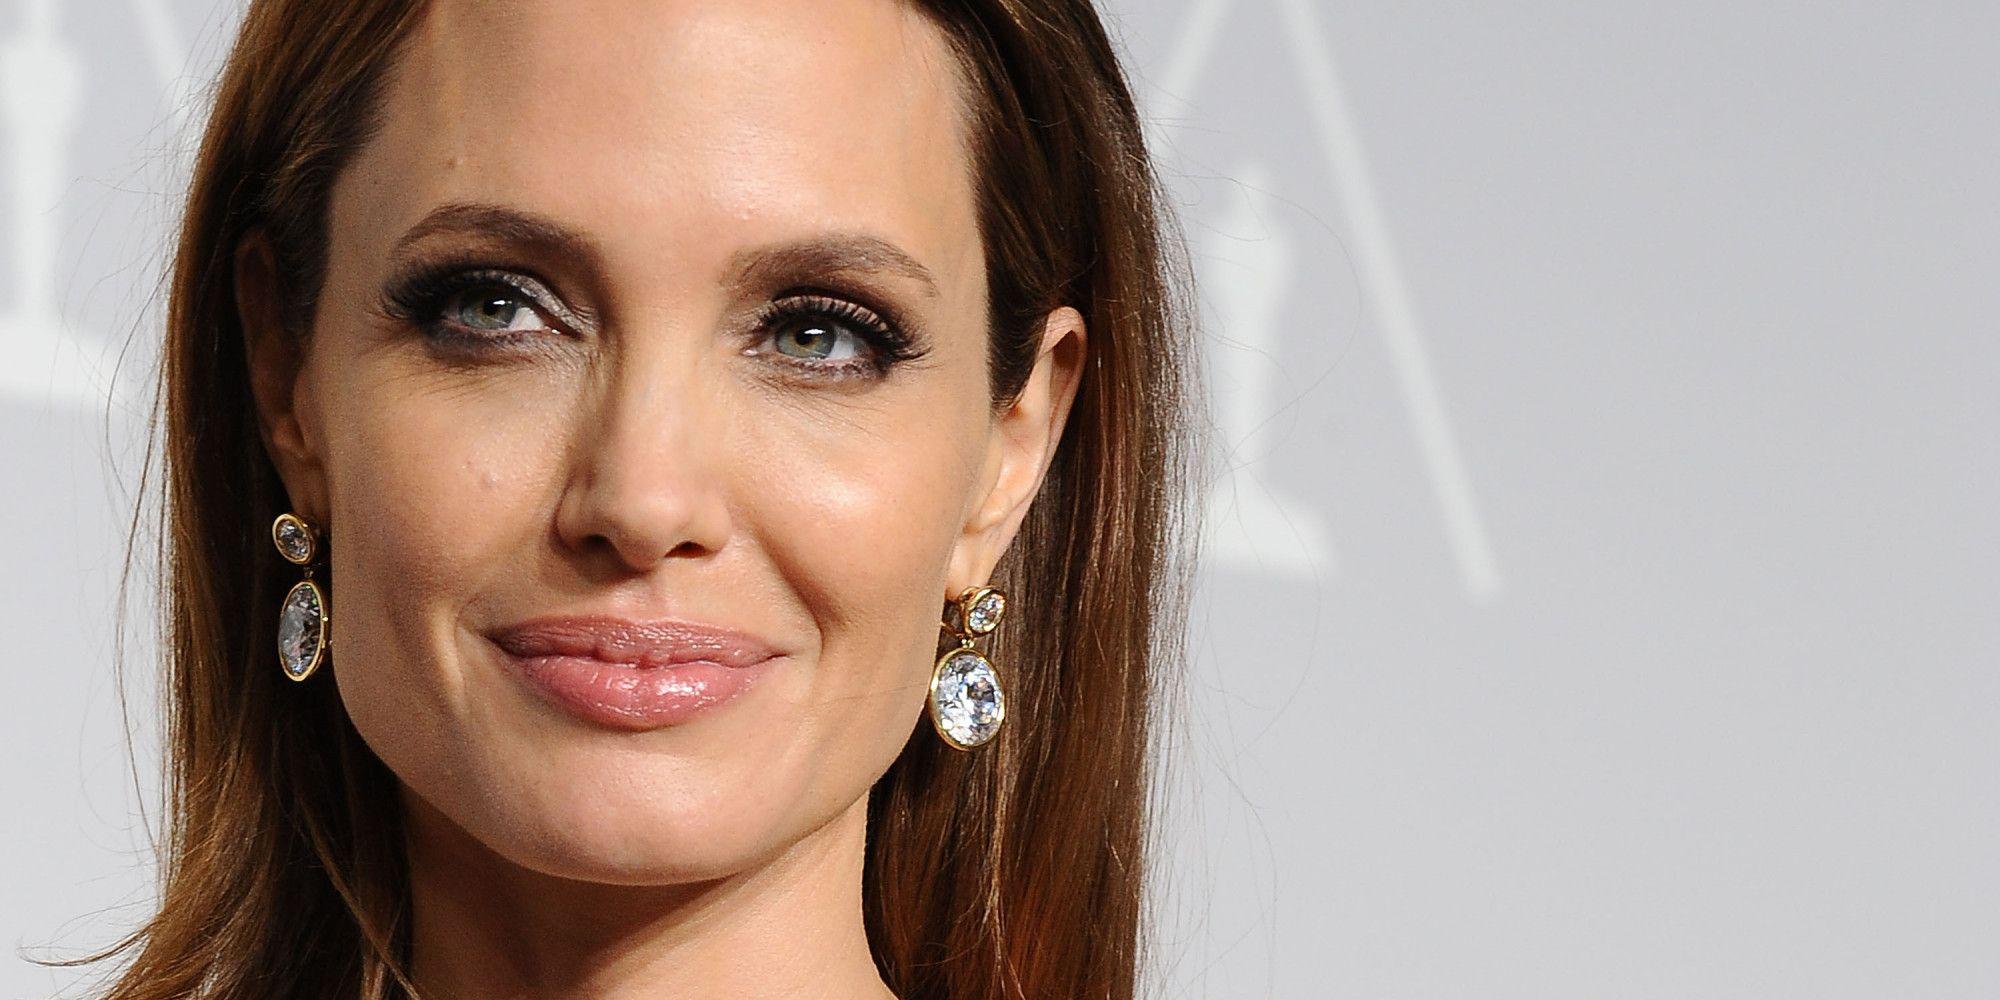 18. Angelina Jolie